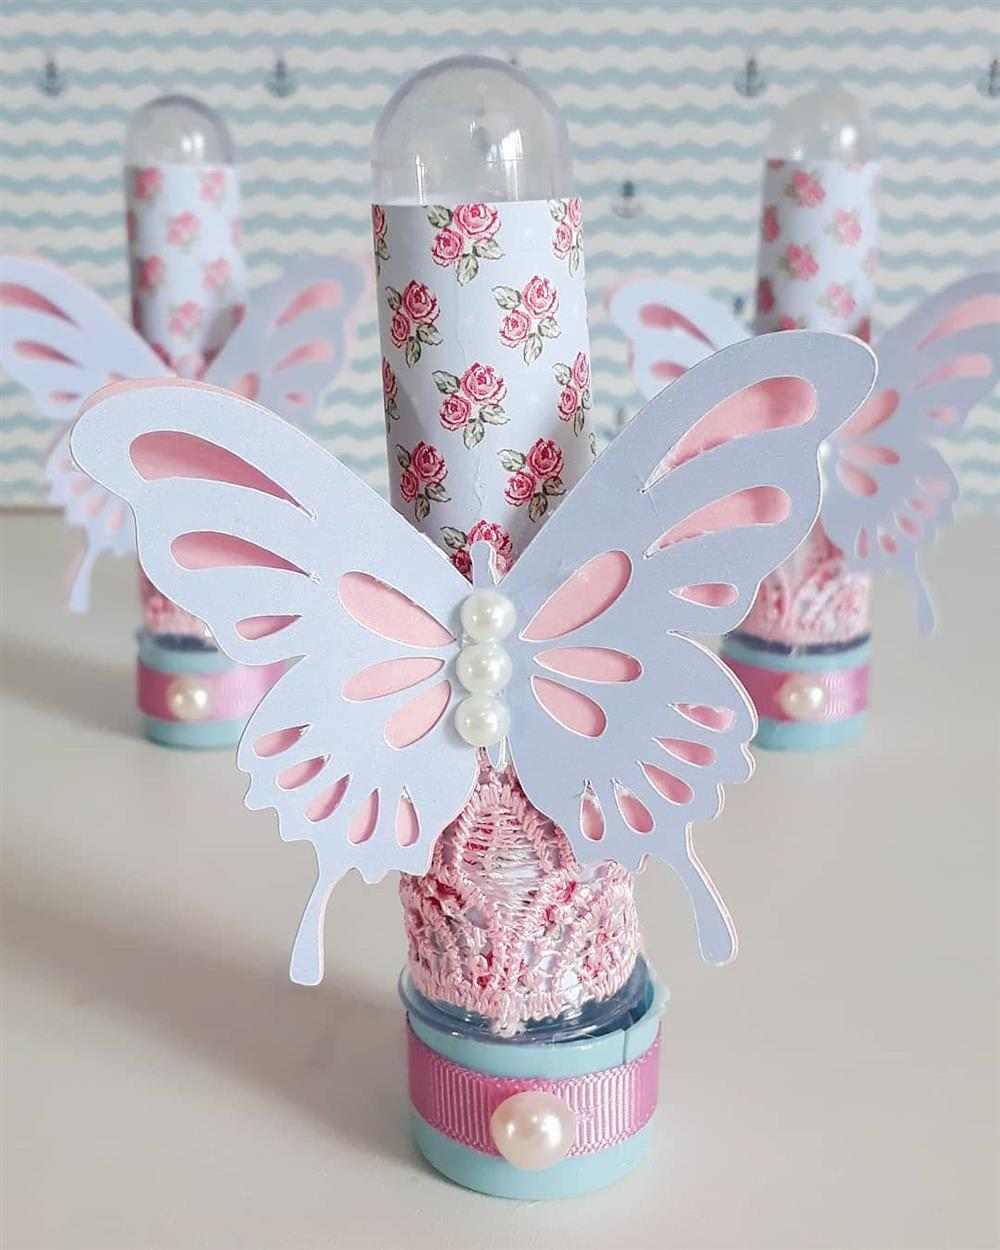 tubete decorado com borboleta